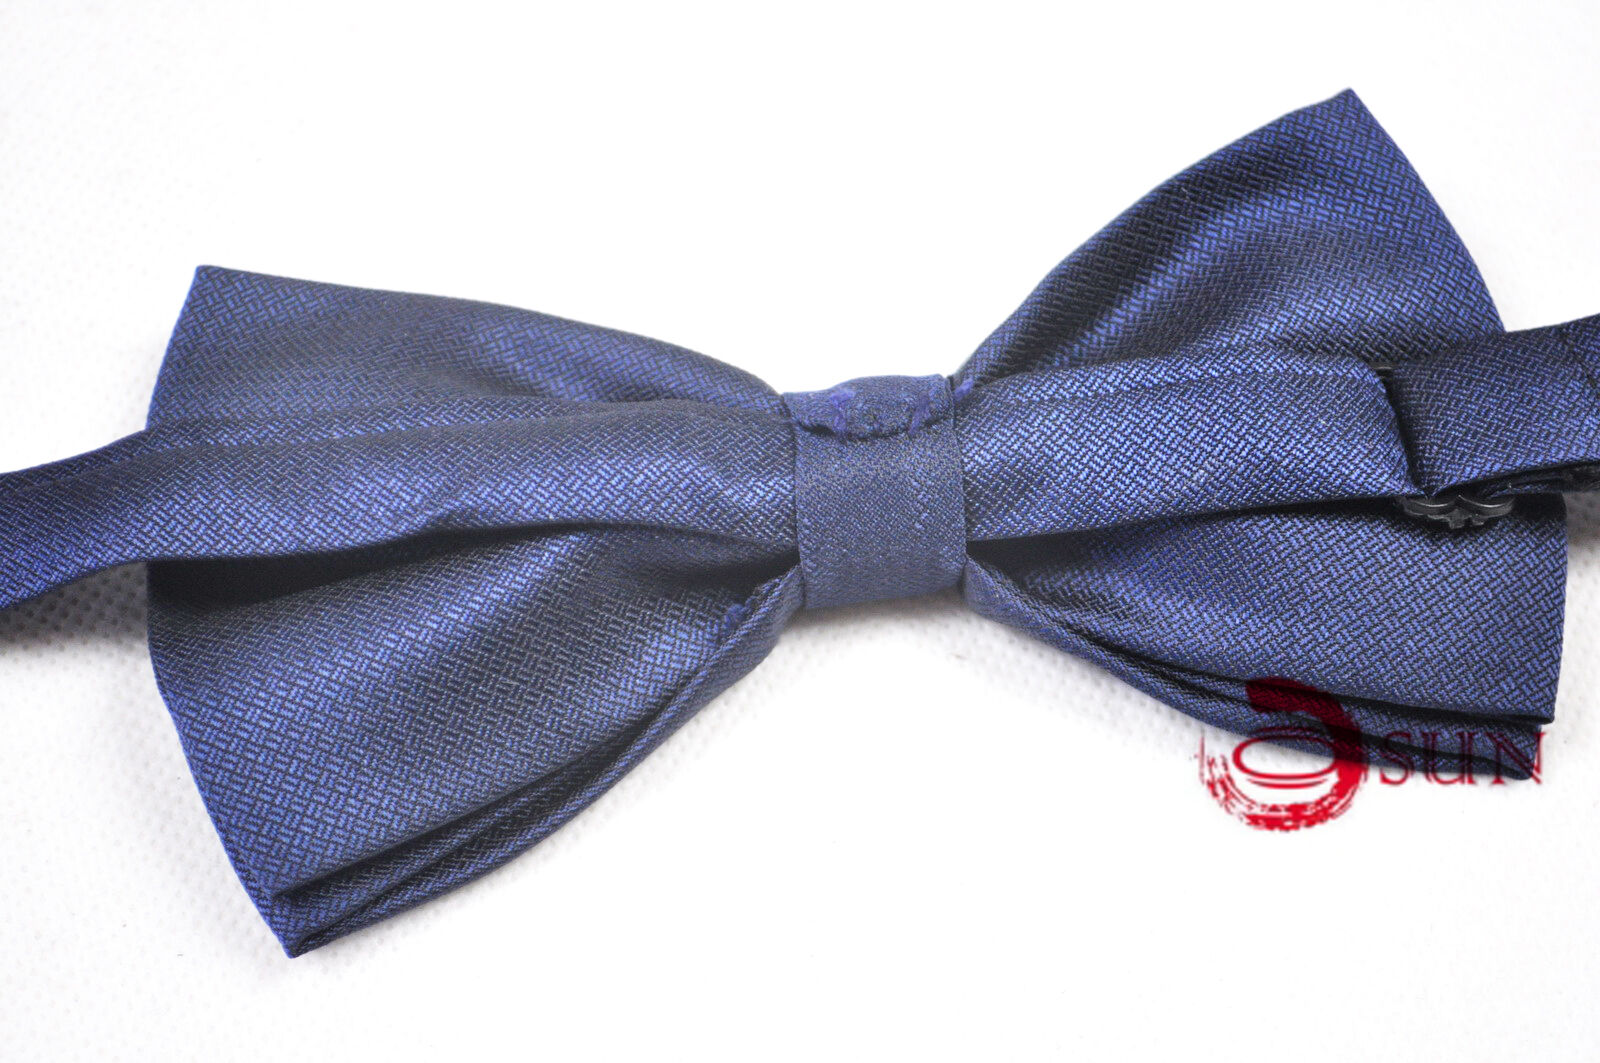 s unisex bowtie tuxedo bow tie navy blue colors